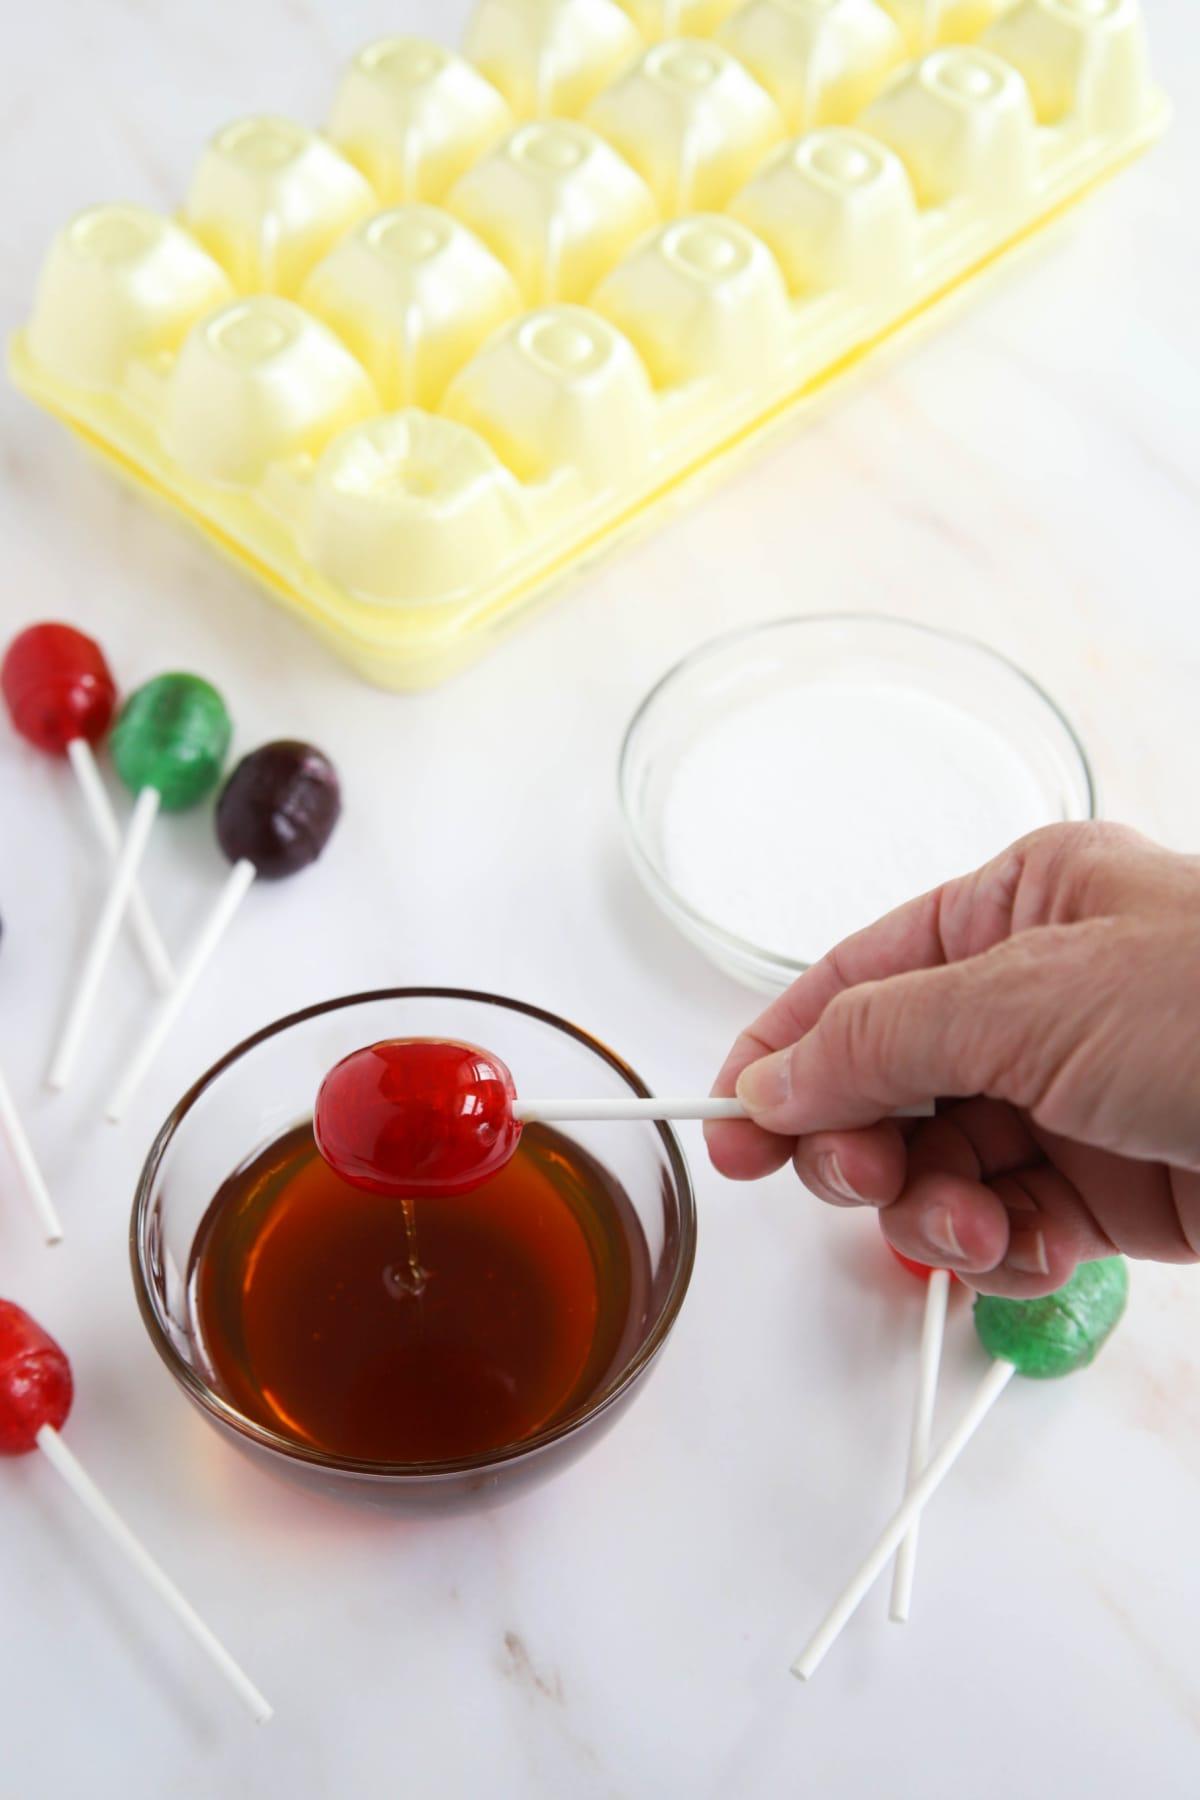 Dipping lollipops in honey